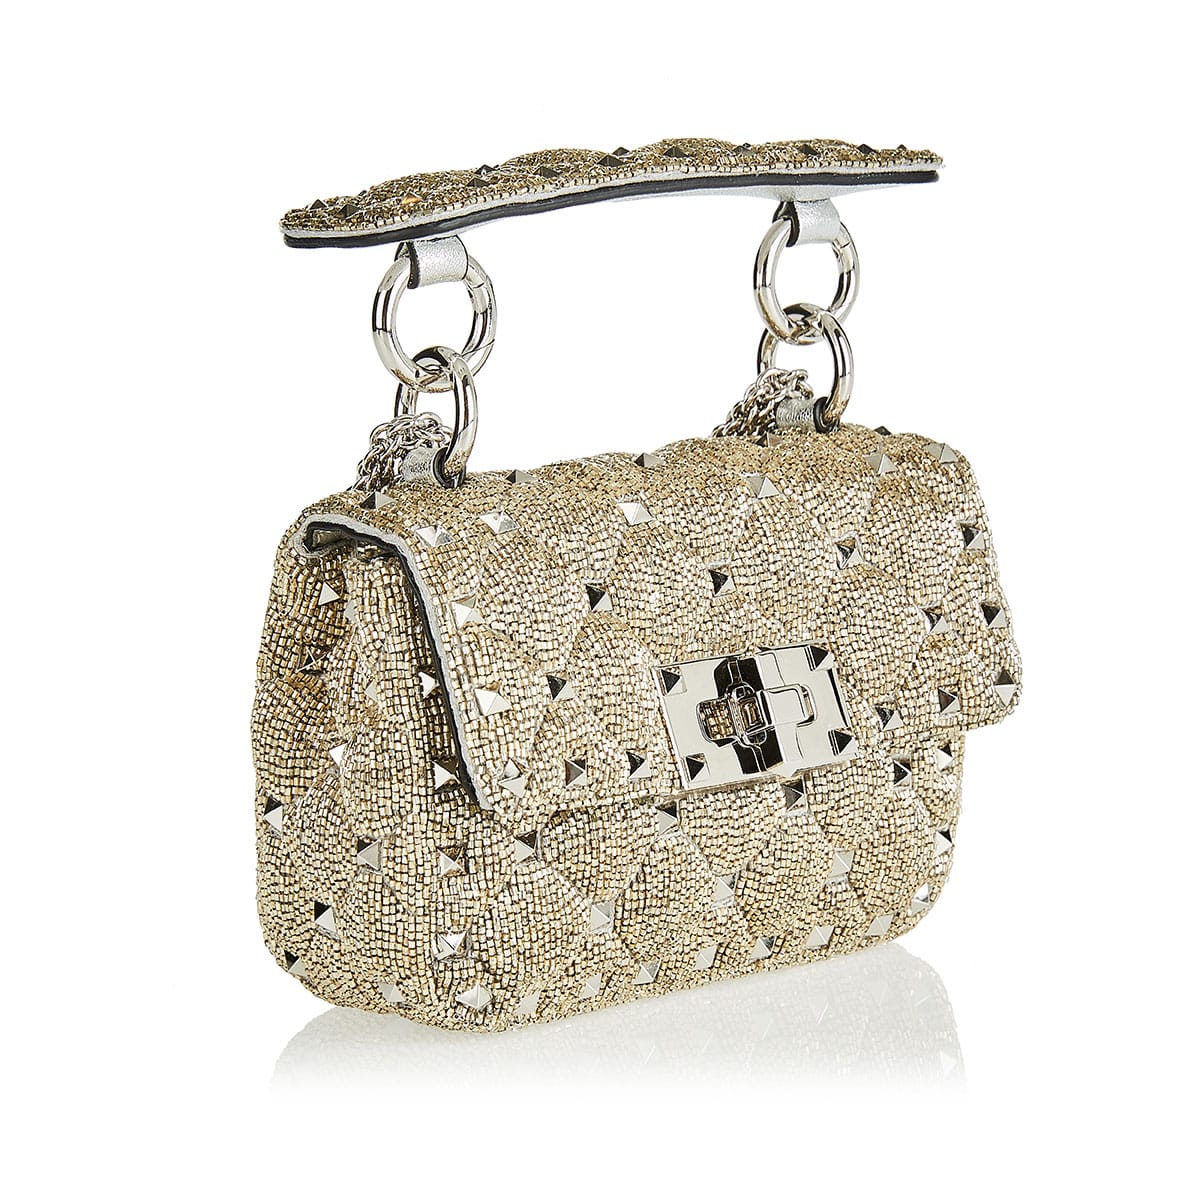 Rockstud Spike bead-embellished micro bag